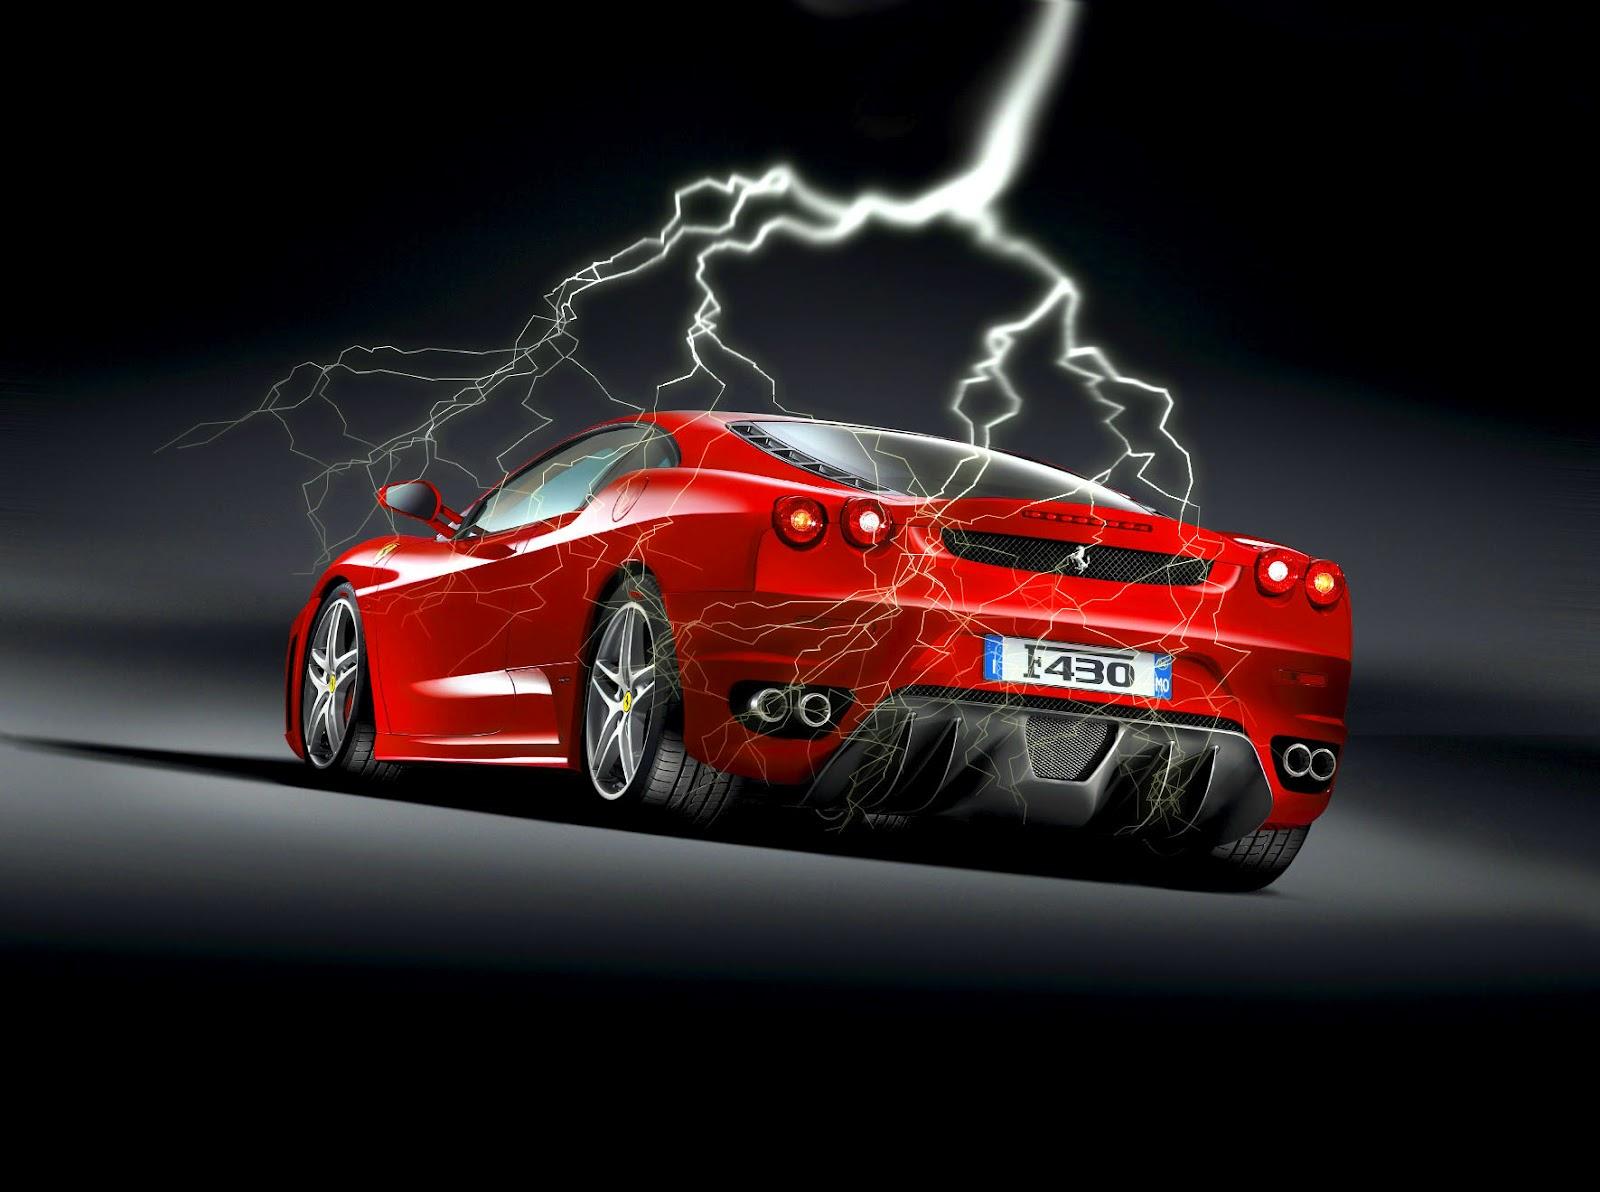 2012 Lamborghini Aventador: cool ferrari wallpapers